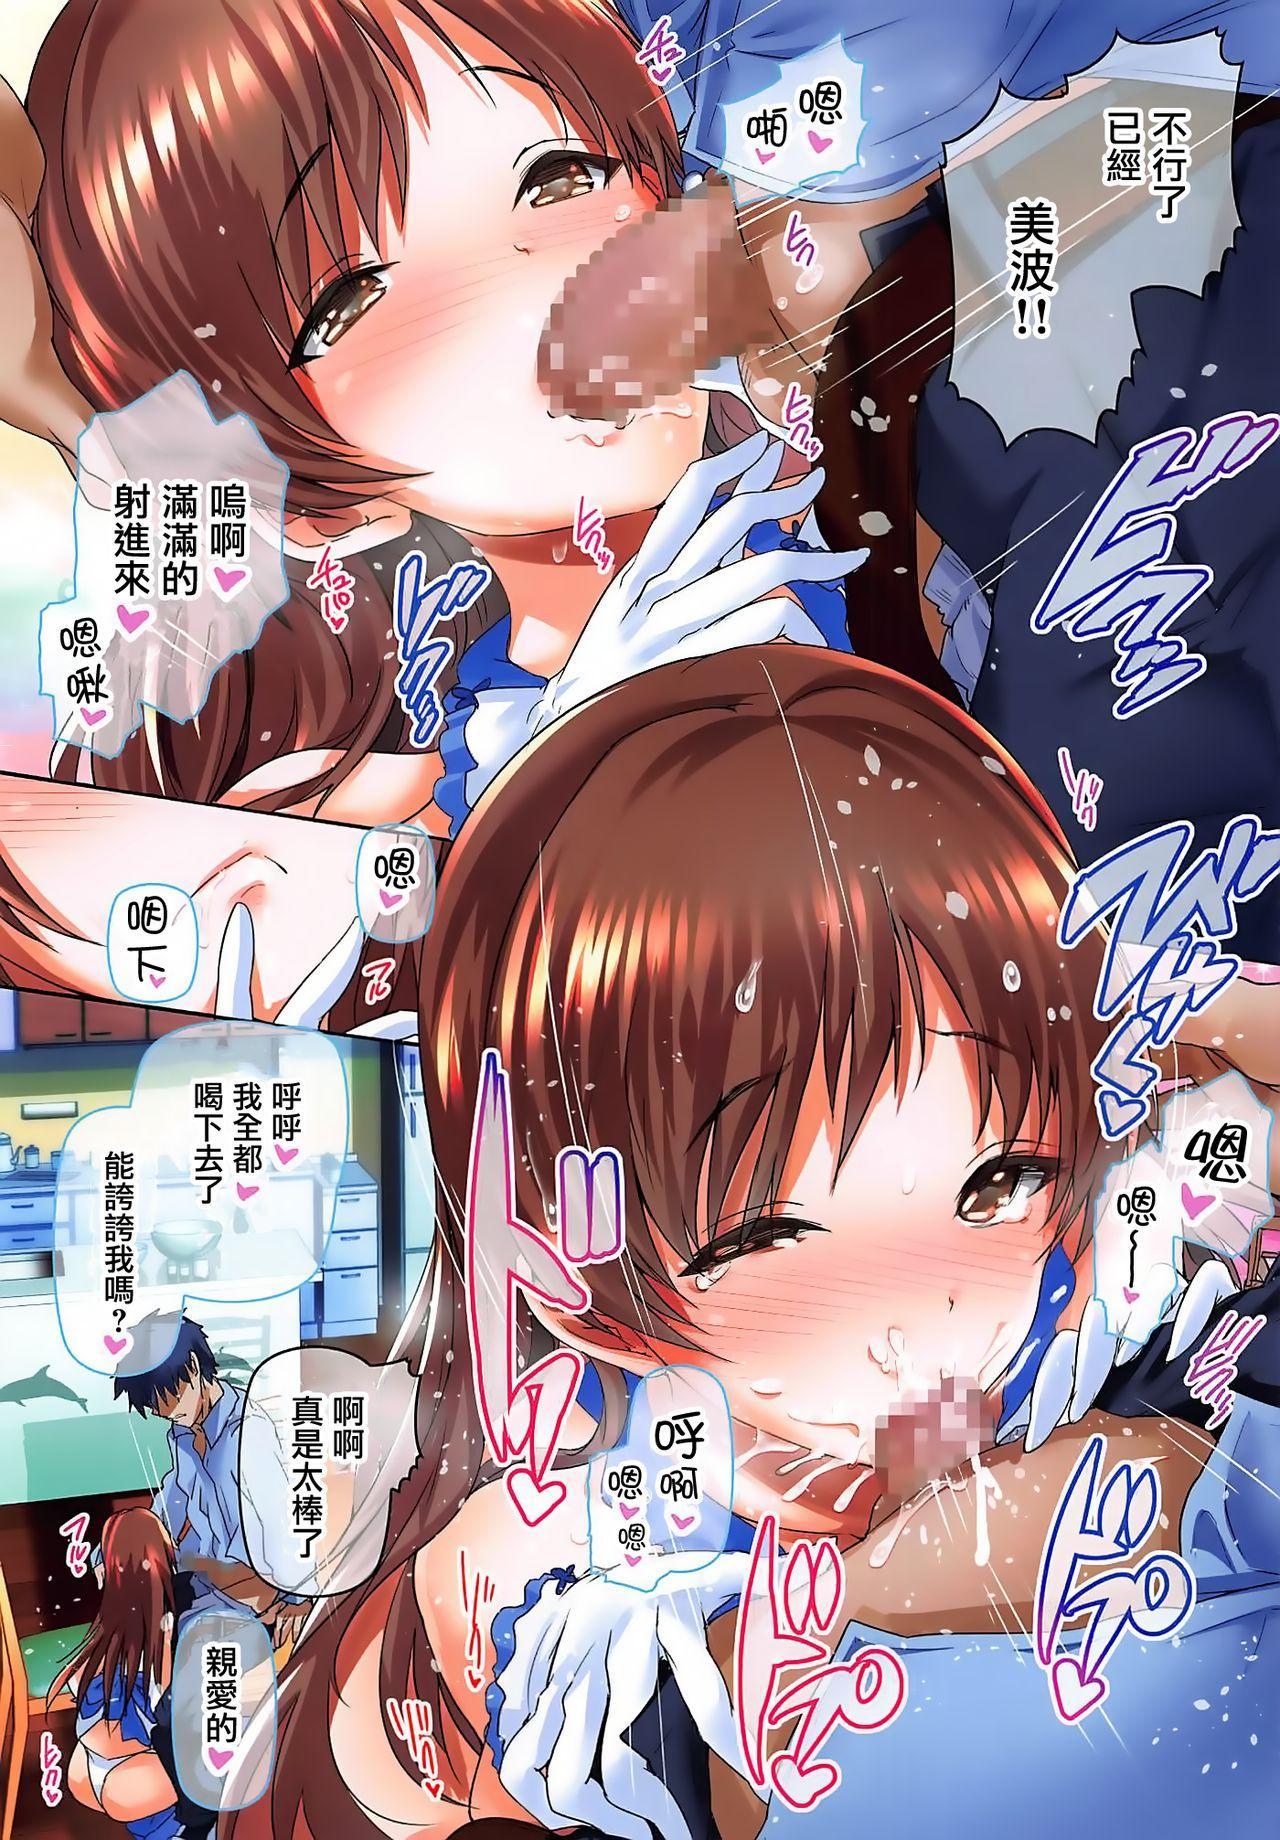 (COMIC1☆11) [Atelier Maruwa (Maruwa Tarou)] Oku-sama wa iDOLS -Wives of CINDERELLA2- (THE IDOLM@STER CINDERELLA GIRLS) [Chinese] [寂月汉化组] 30